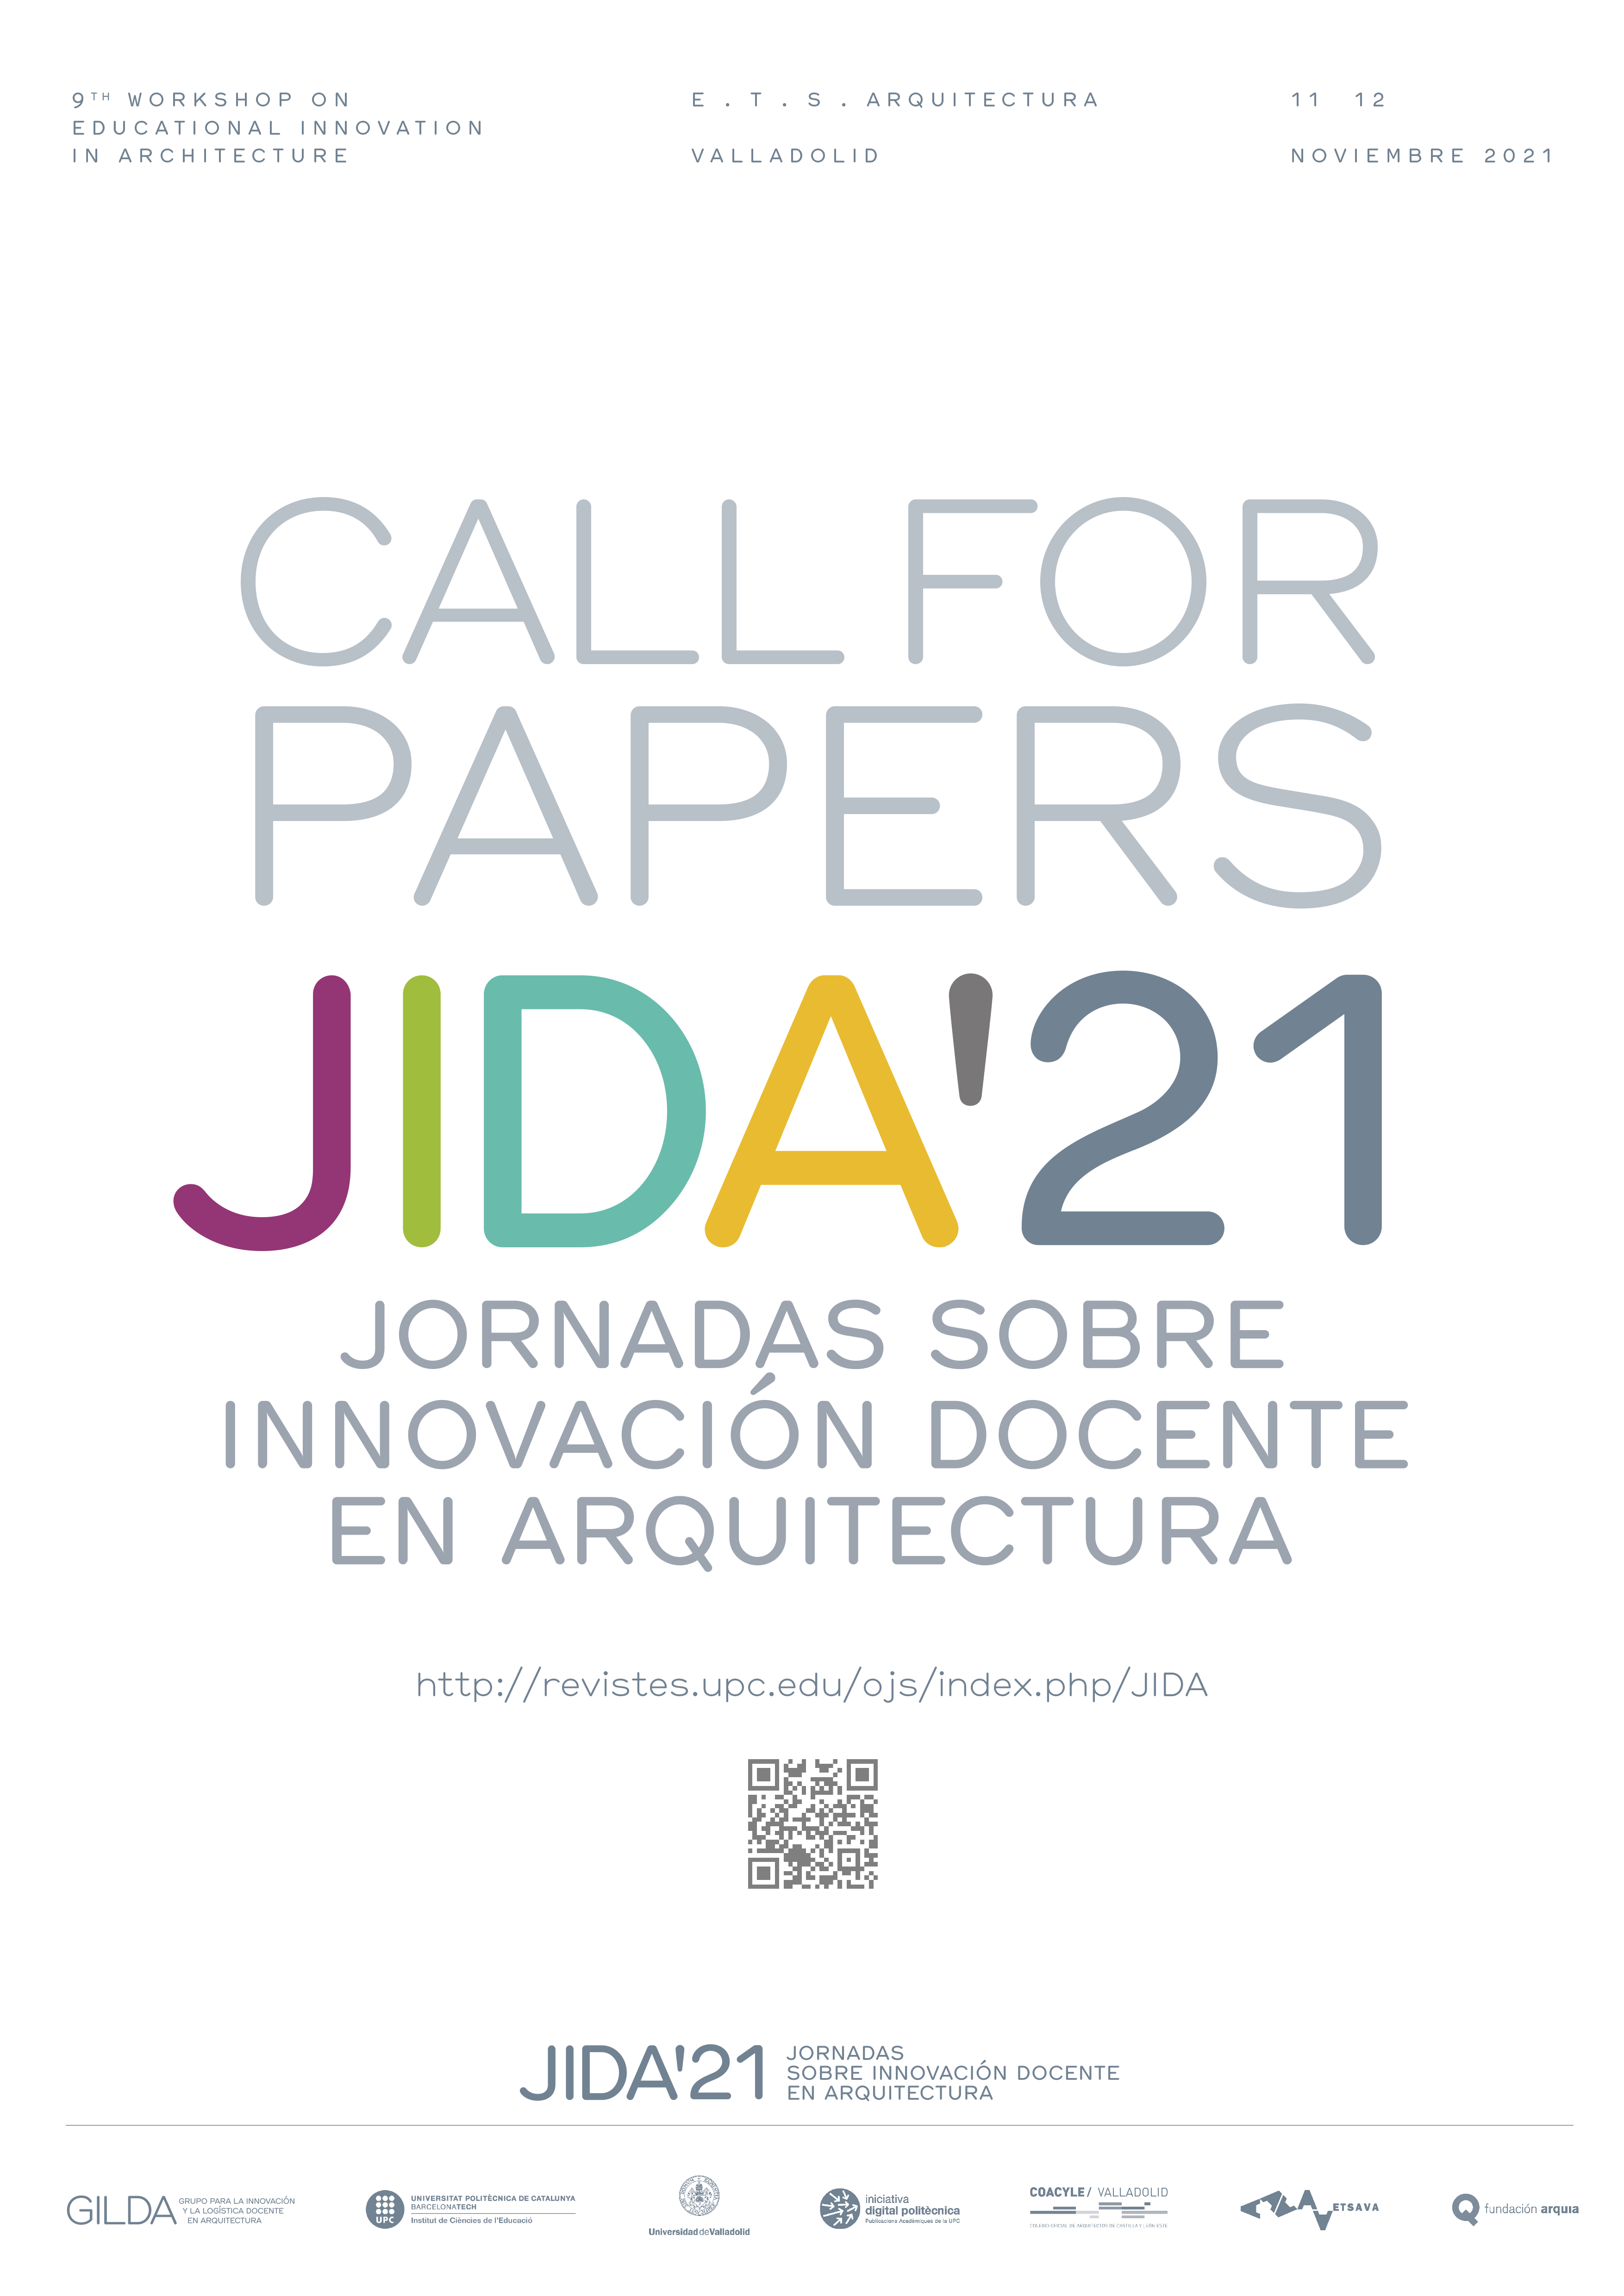 03_JIDA'21_aplicaciones_cartel A3_call_for_papers_210301.jpg